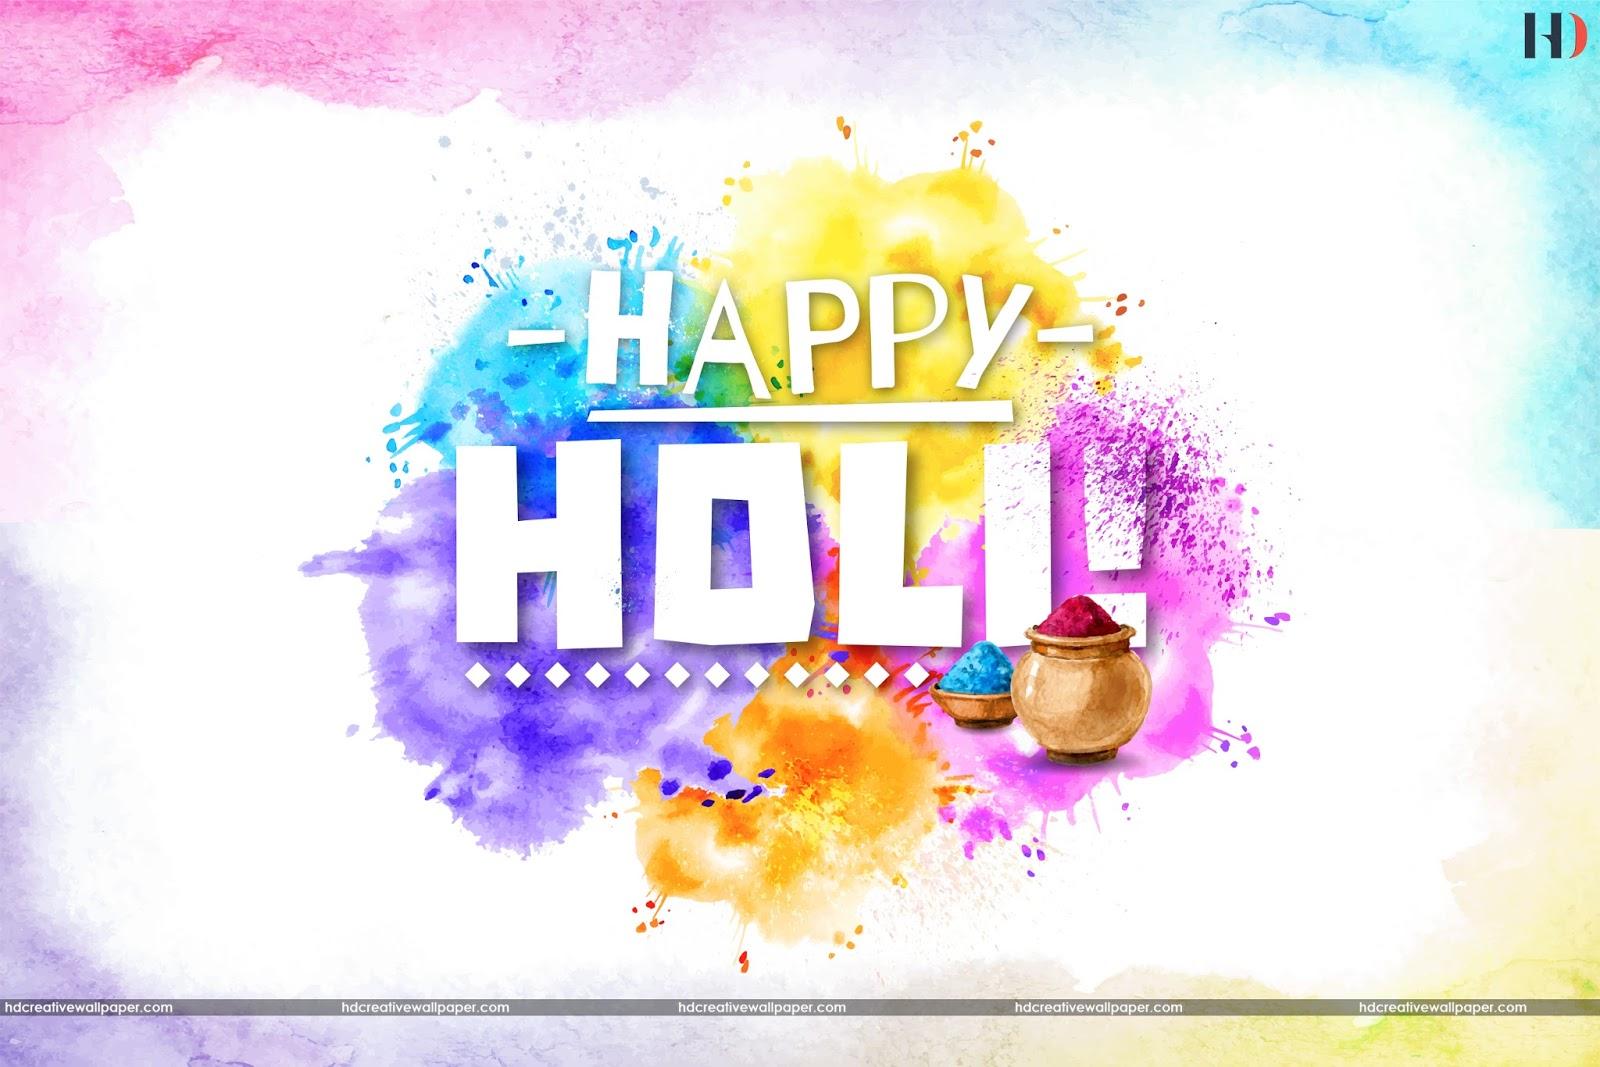 hd creative wallpaper: happy holi 2018